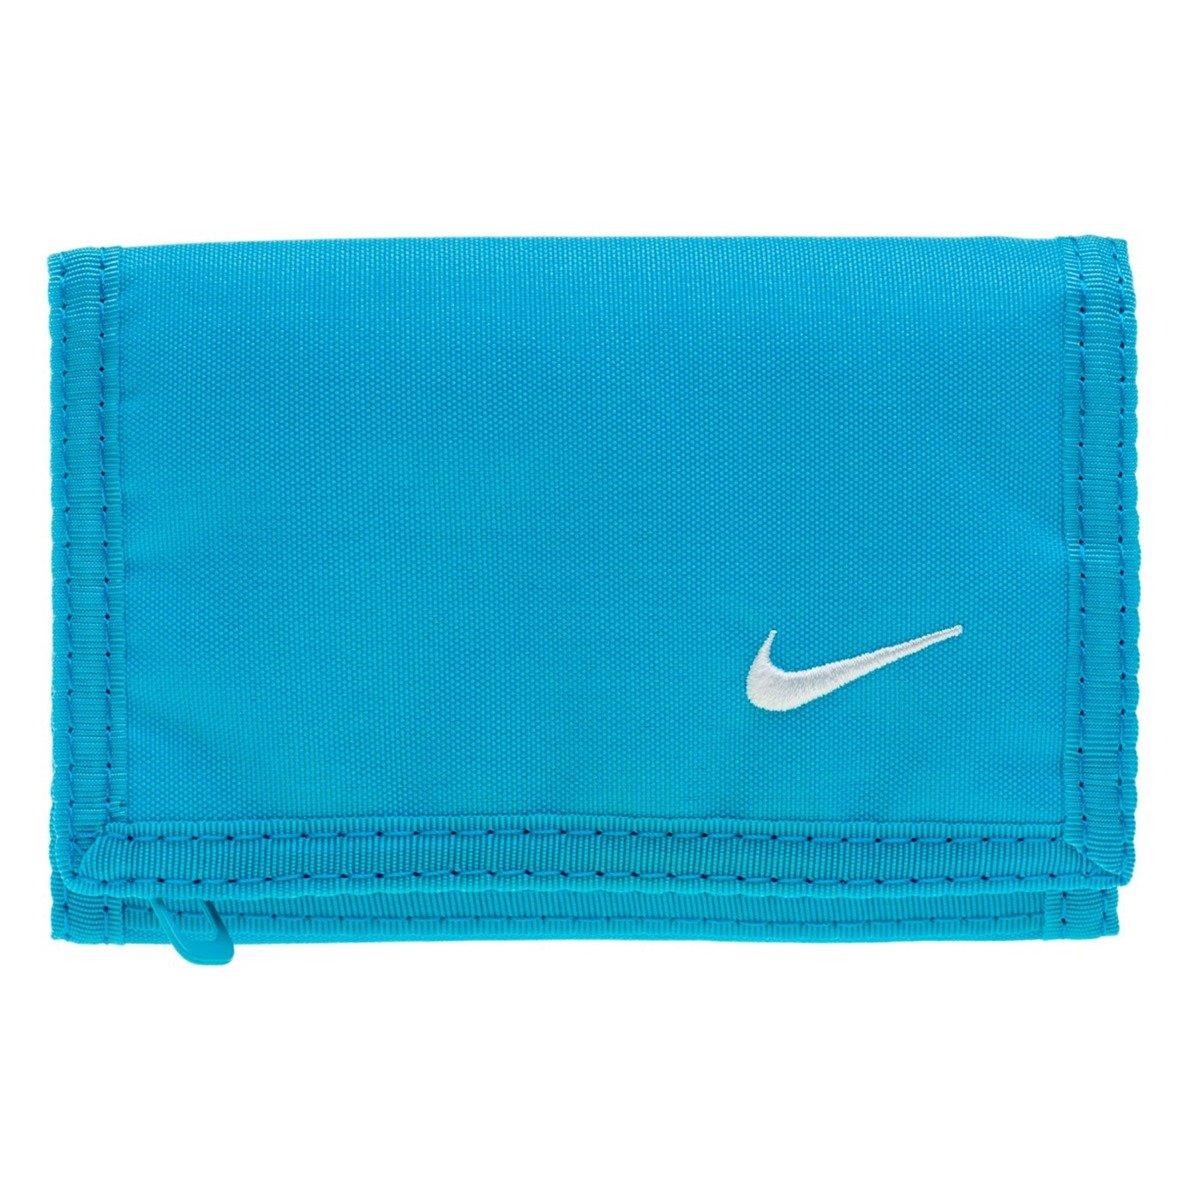 dd6b41bff29e5 Portfel Nike Basic Wallet - N.IA.08.429.NS Błekitny | Akcesoria ...